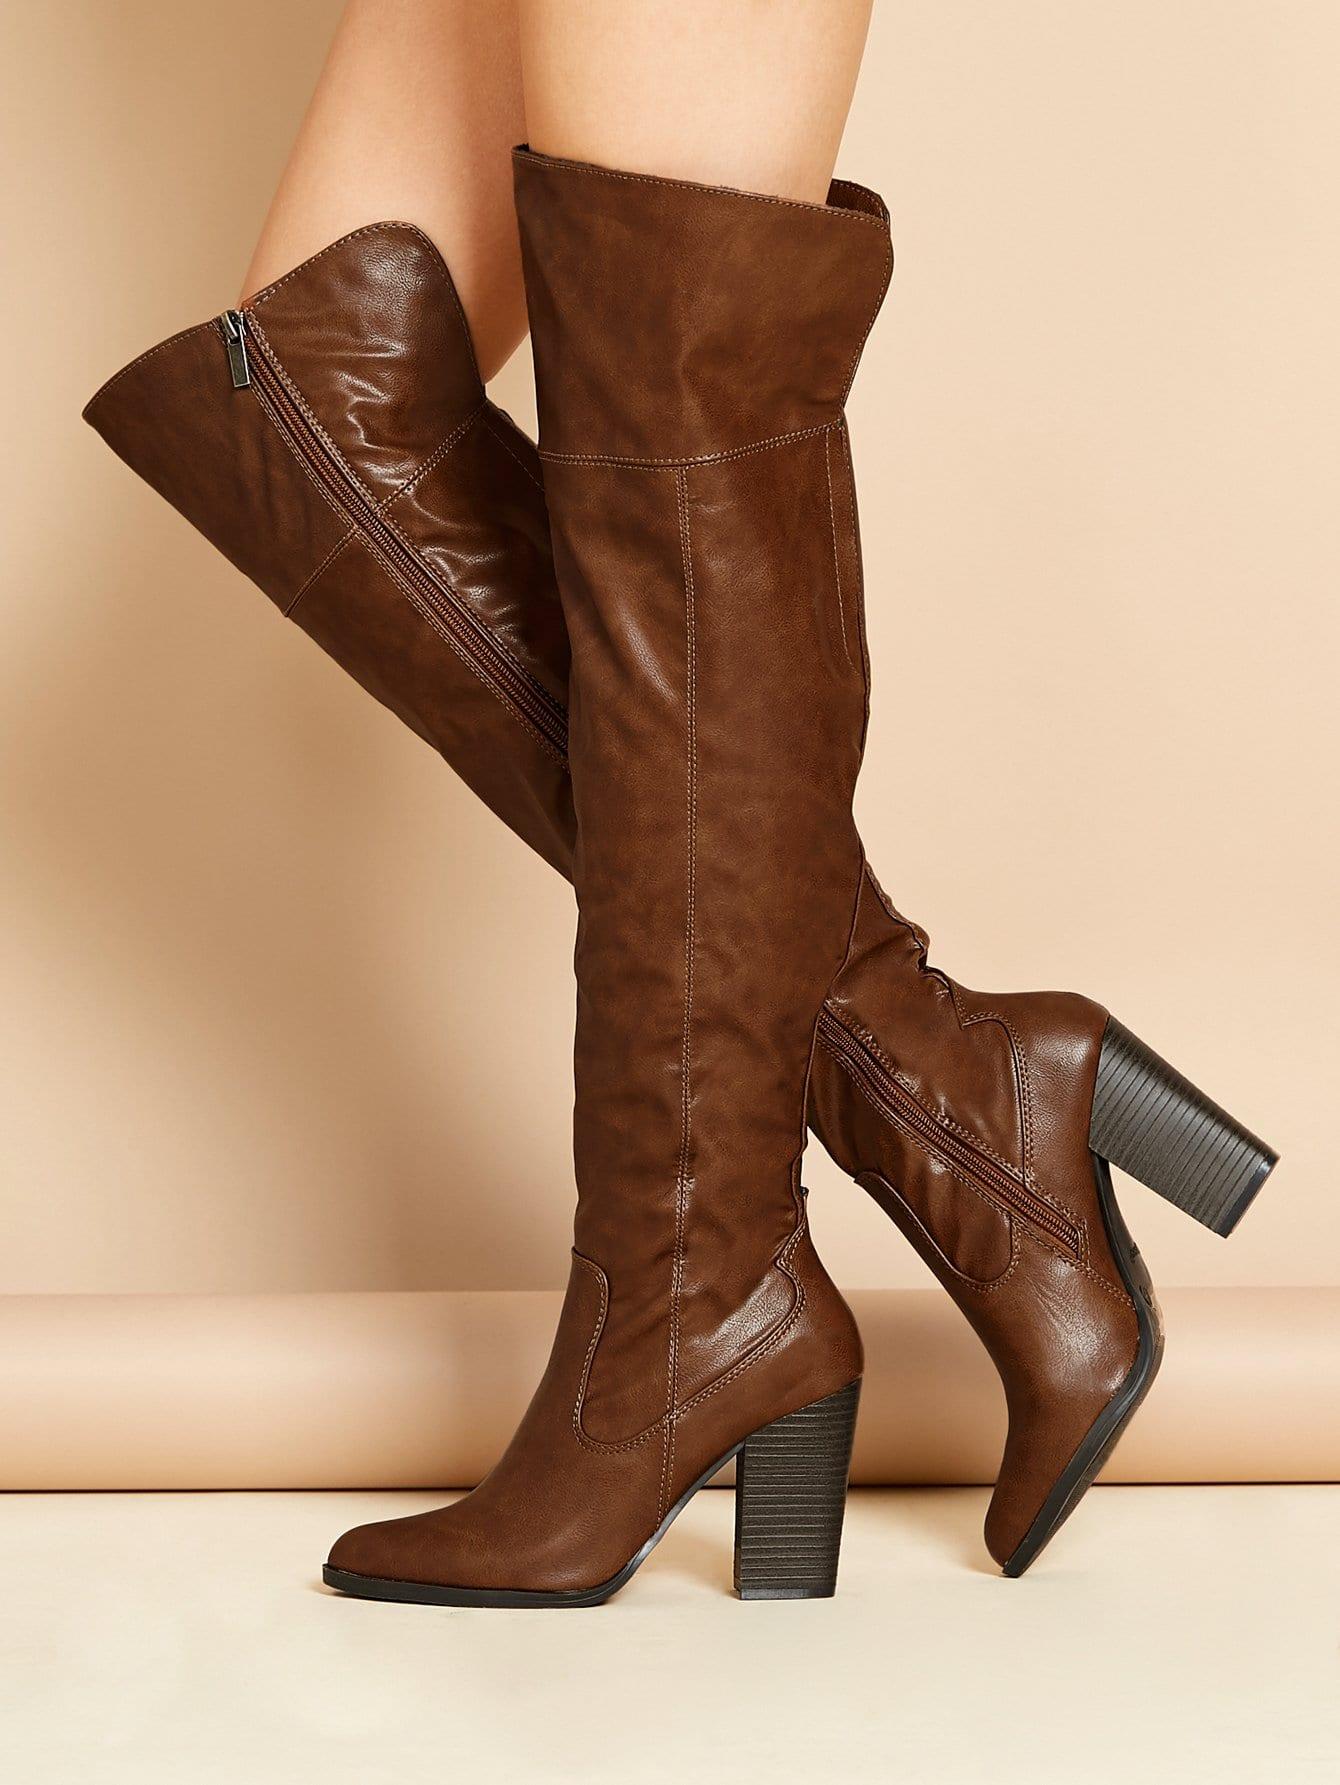 982db7b5356 Almond Toe Crinkle Thigh High Stacked Heel Boots | MakeMeChic.COM